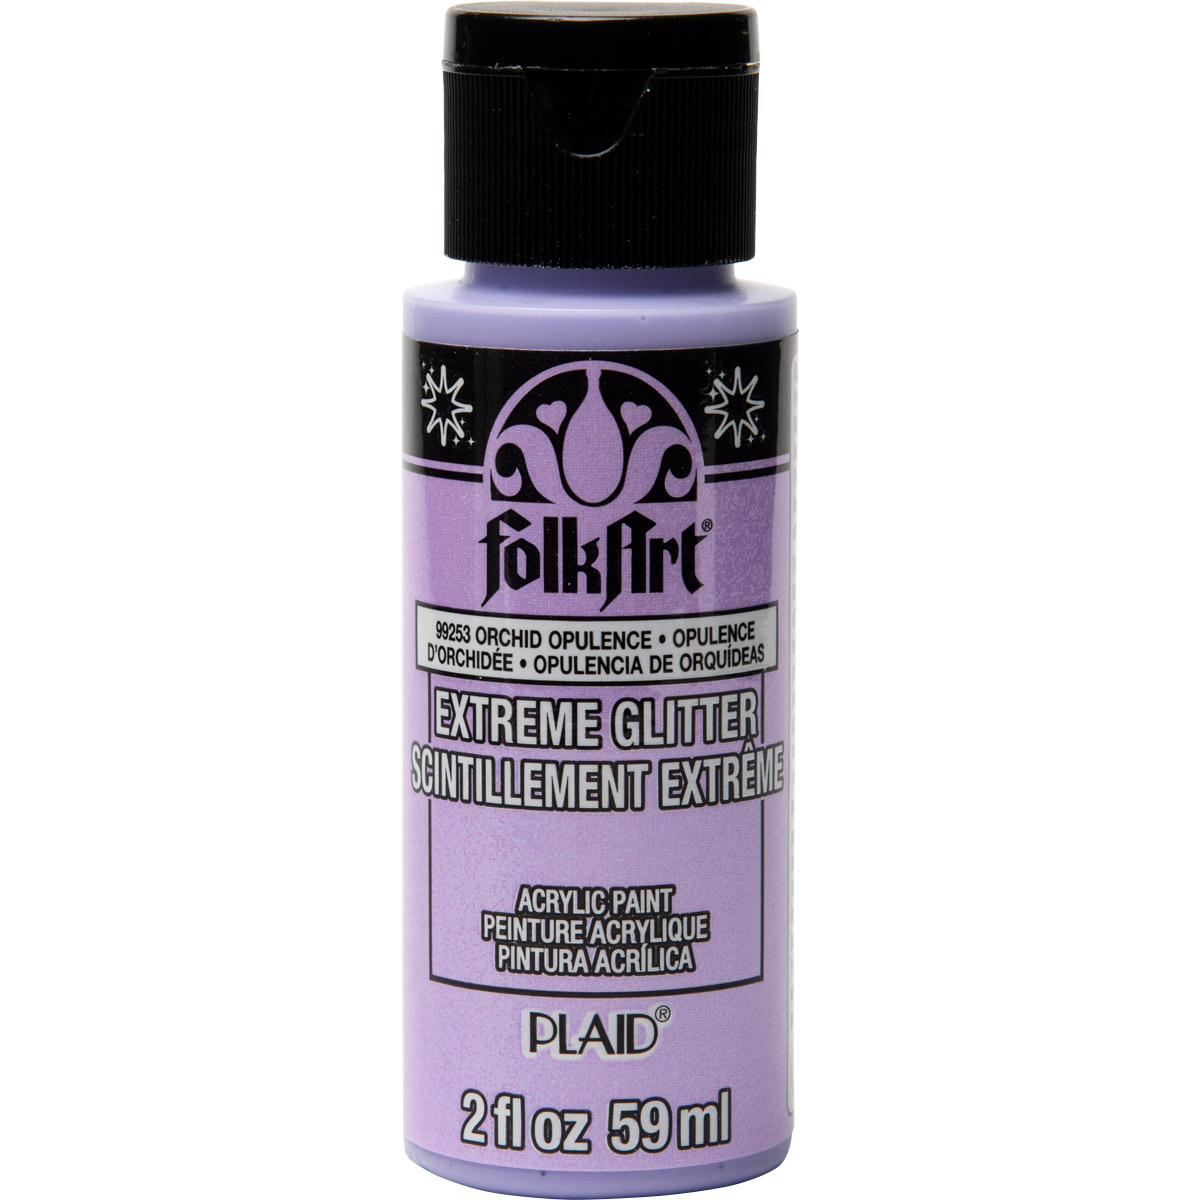 FolkArt ® Extreme Glitter™ - Orchid Opulence, 2 oz. - 99253